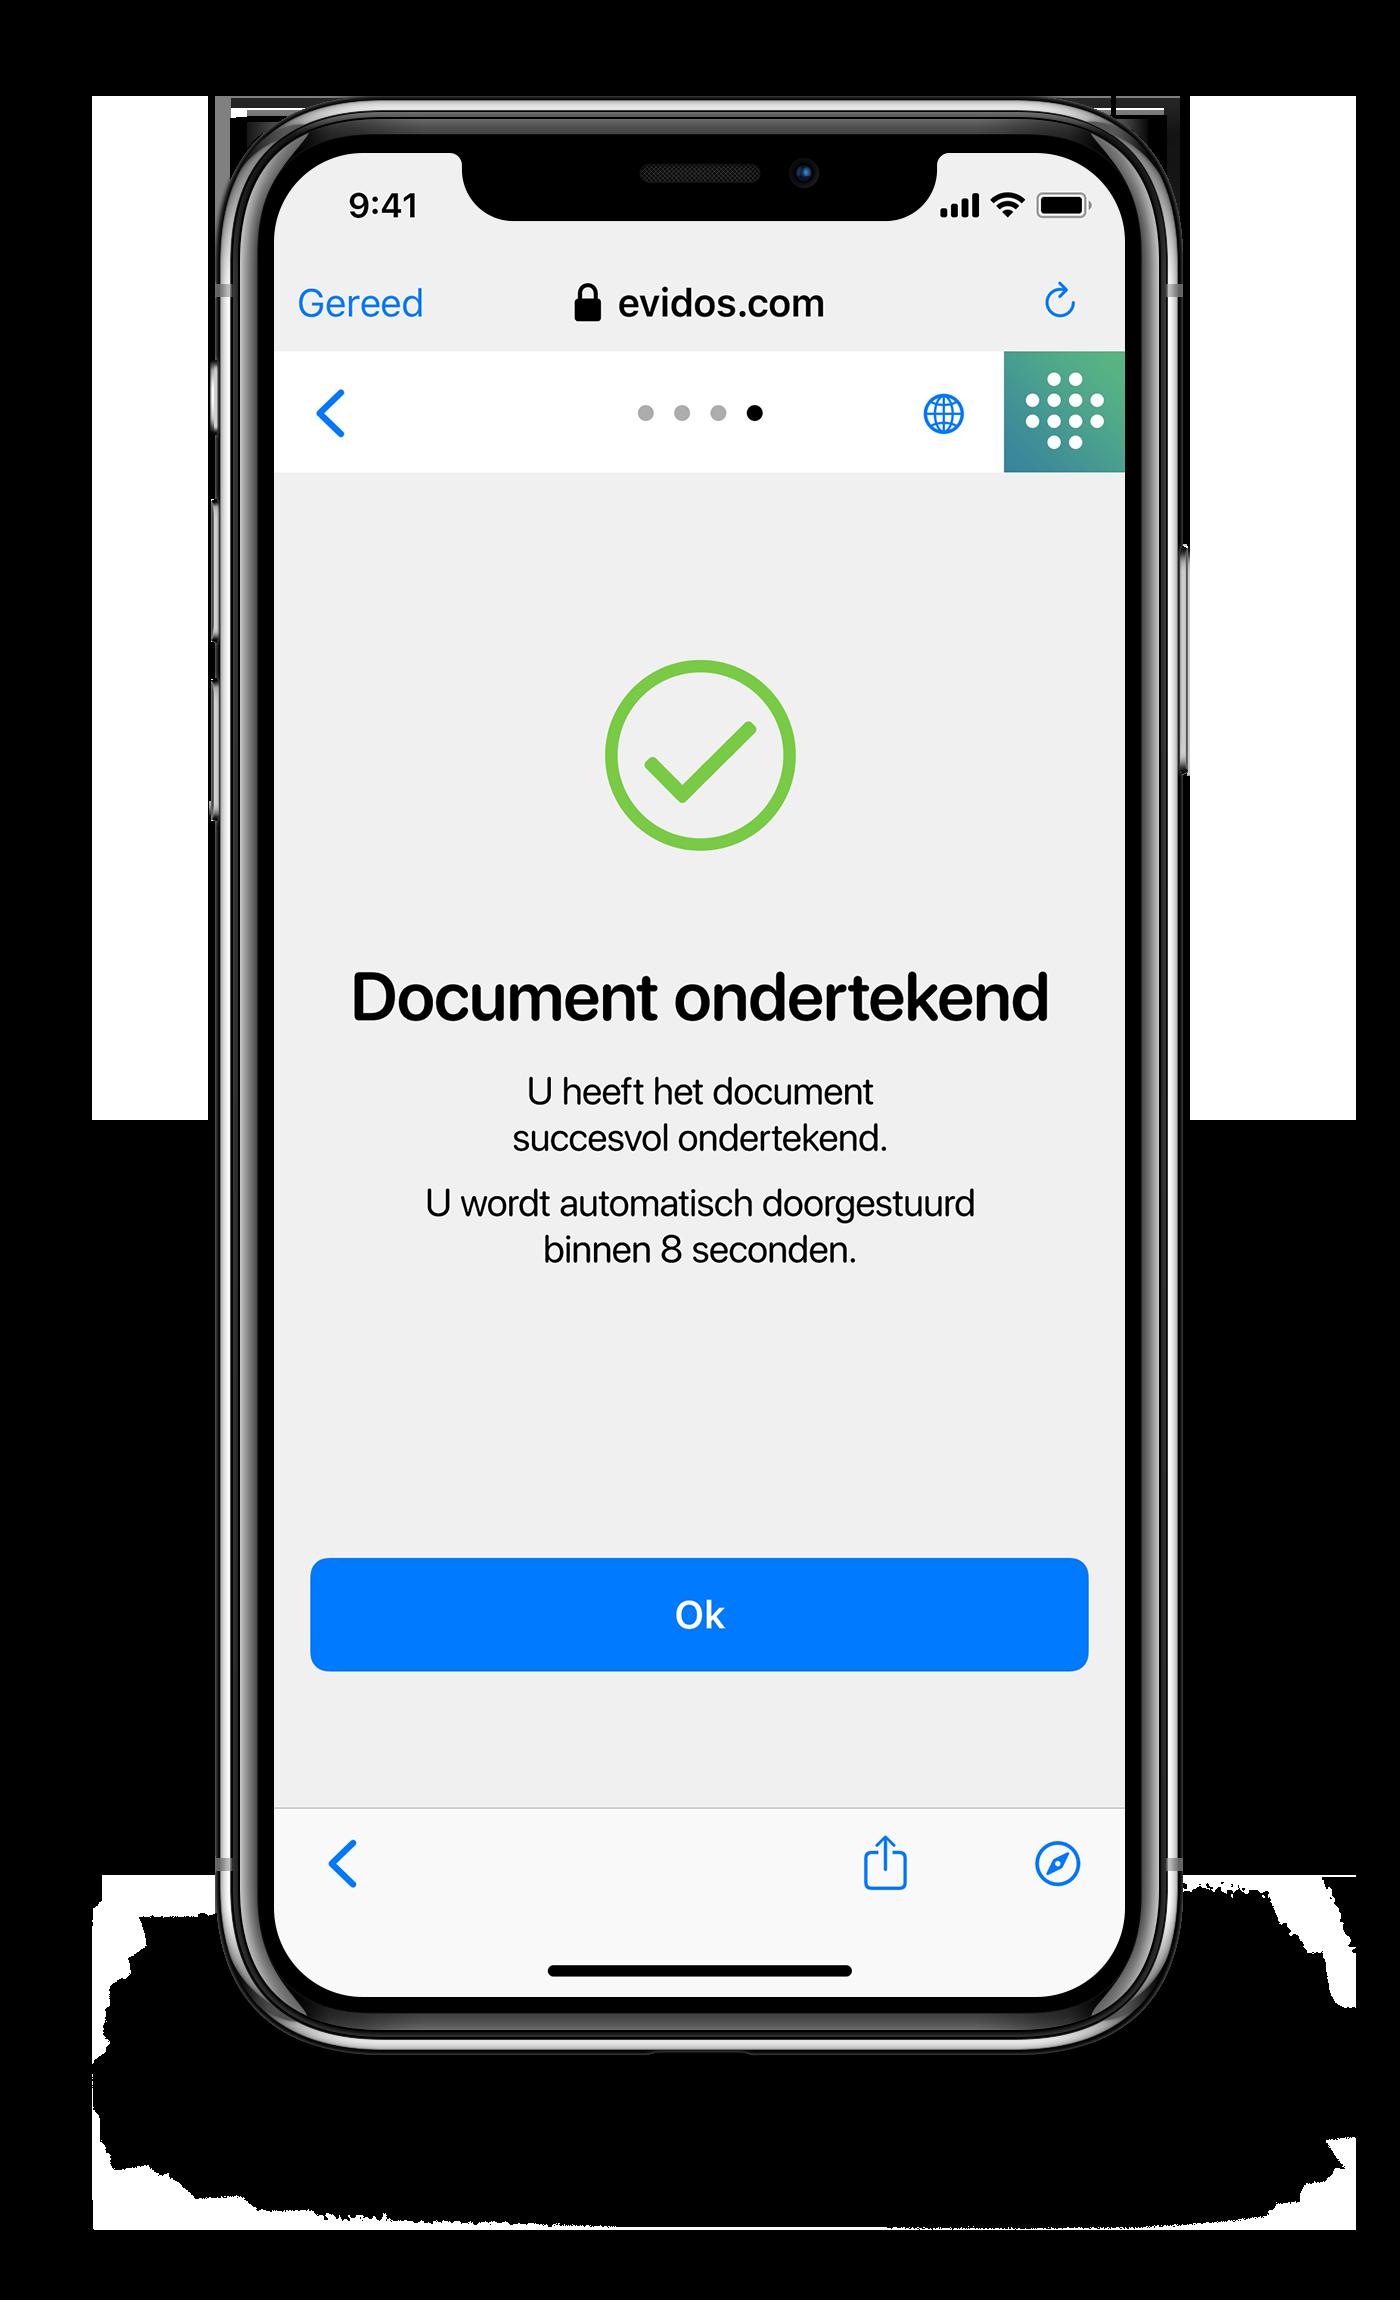 Ondertekenen - NL - stap 4